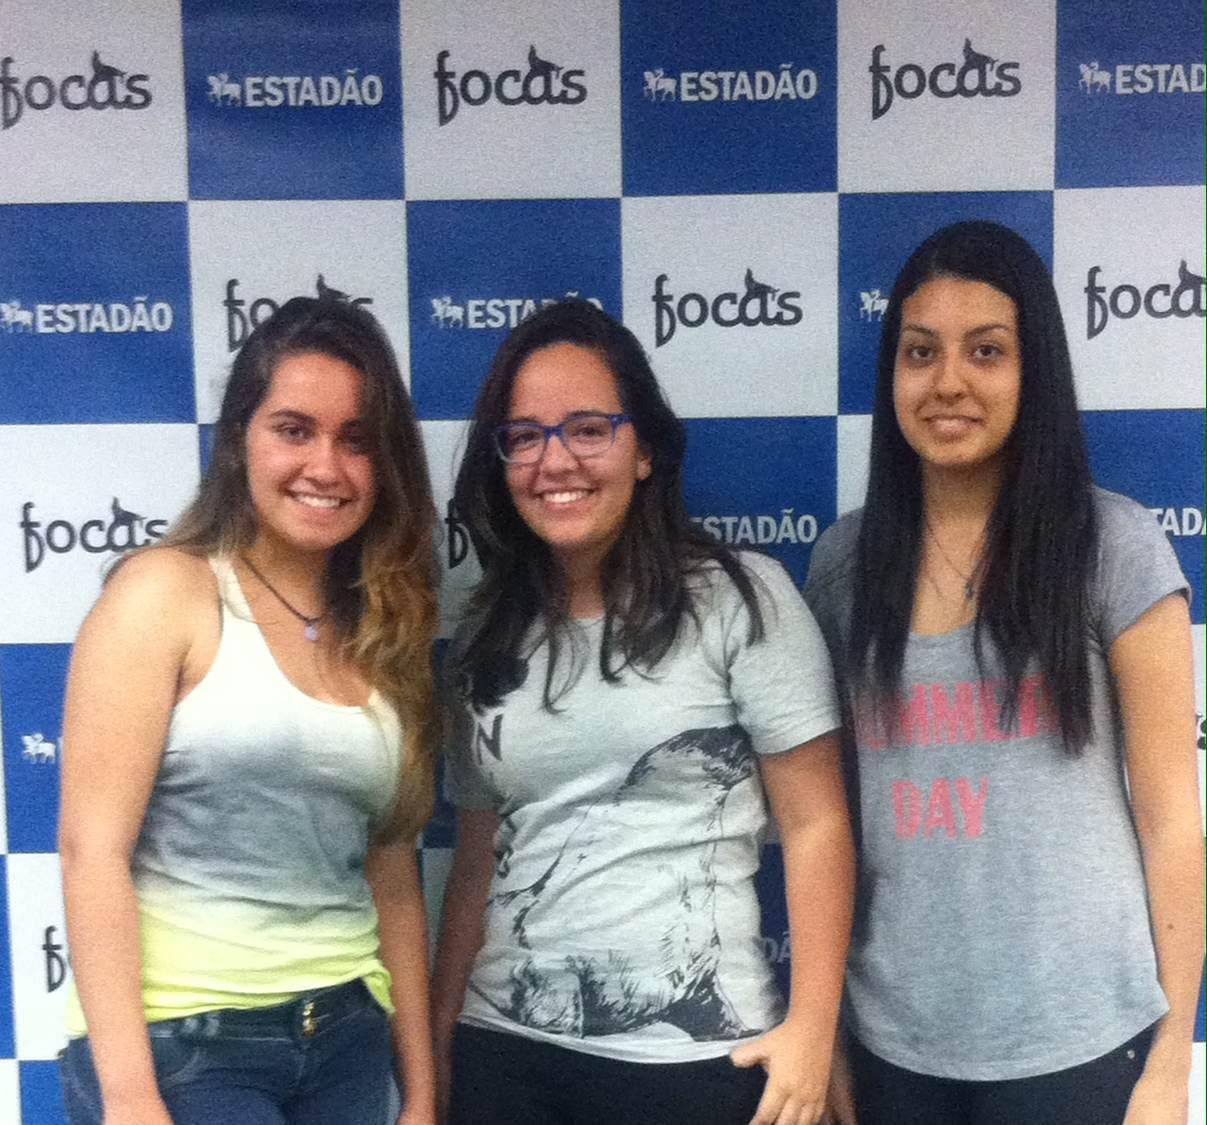 Beatriz Oliveira, Ana Paula Bimbati e Fernanda Pereira.